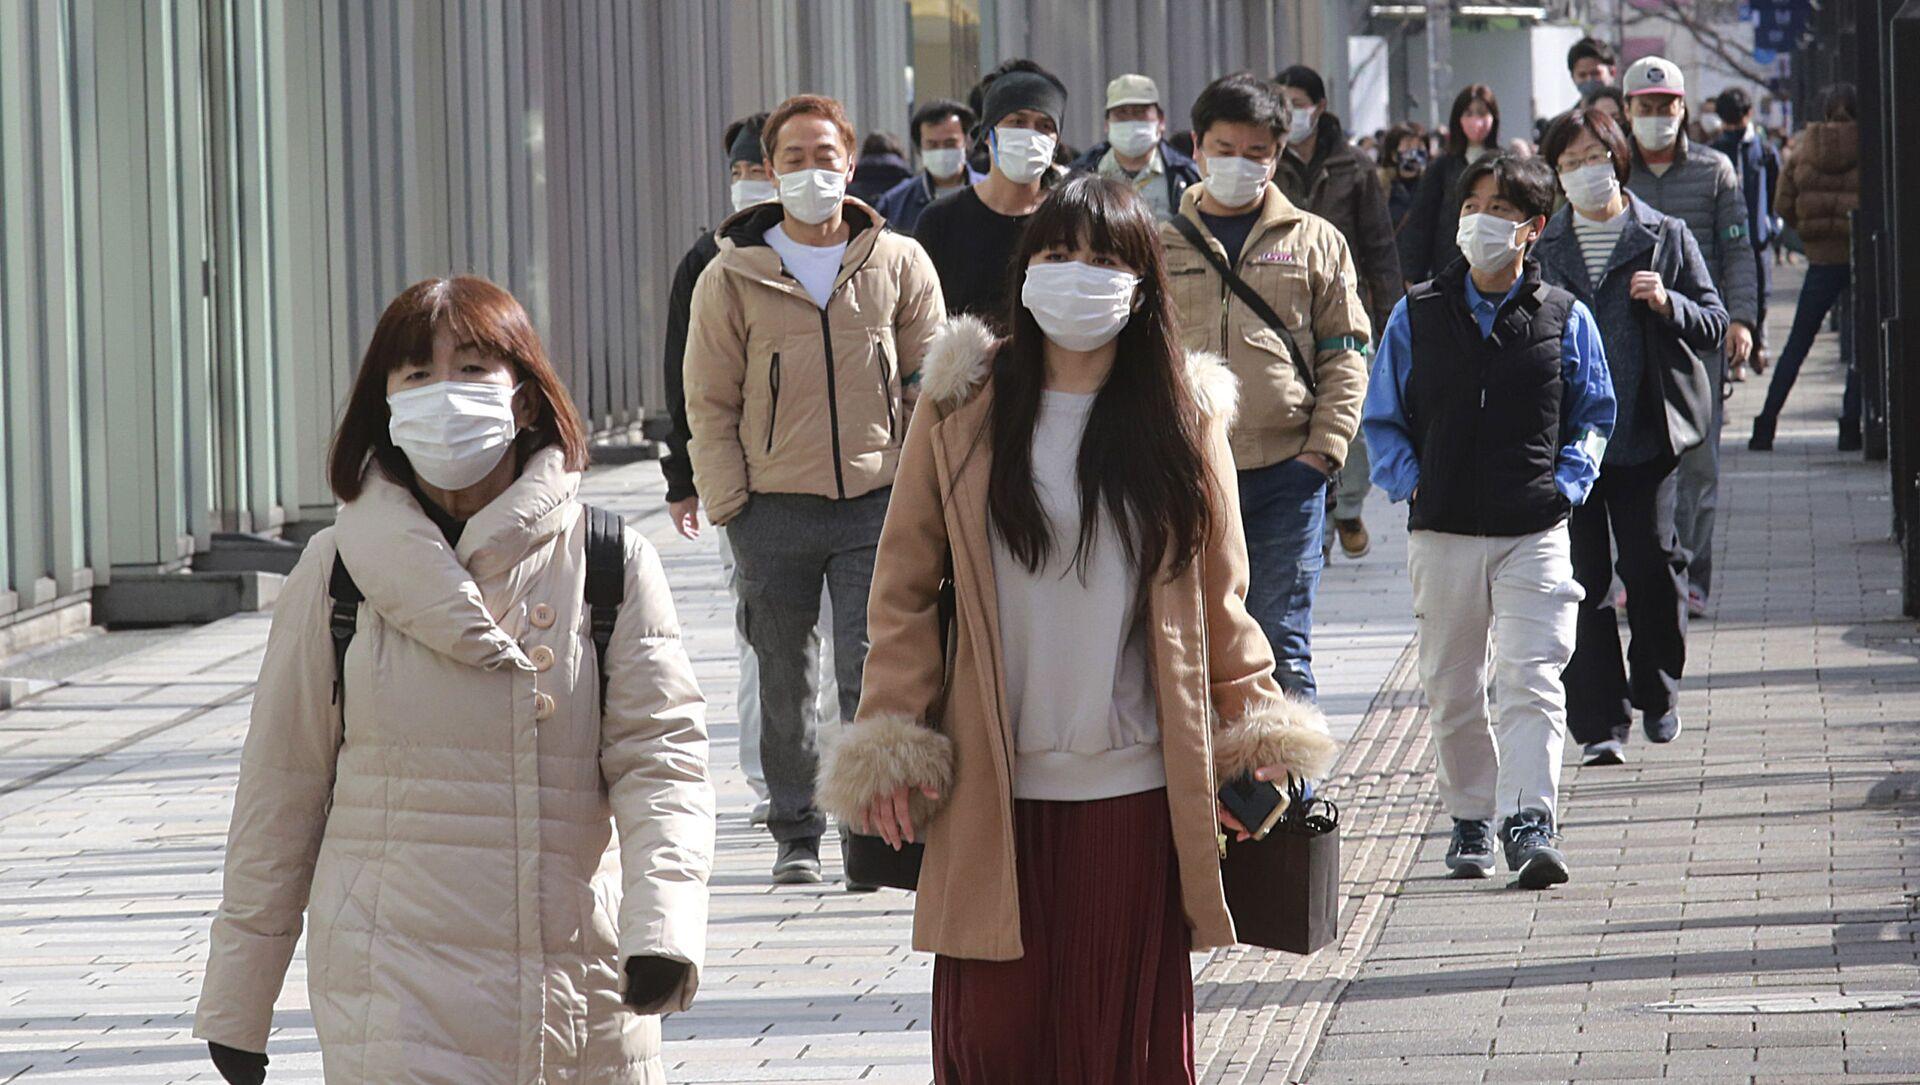 Пандемия коронавируса COVID 19 - люди в масках в Токио, Япония - Sputnik Грузия, 1920, 26.03.2021